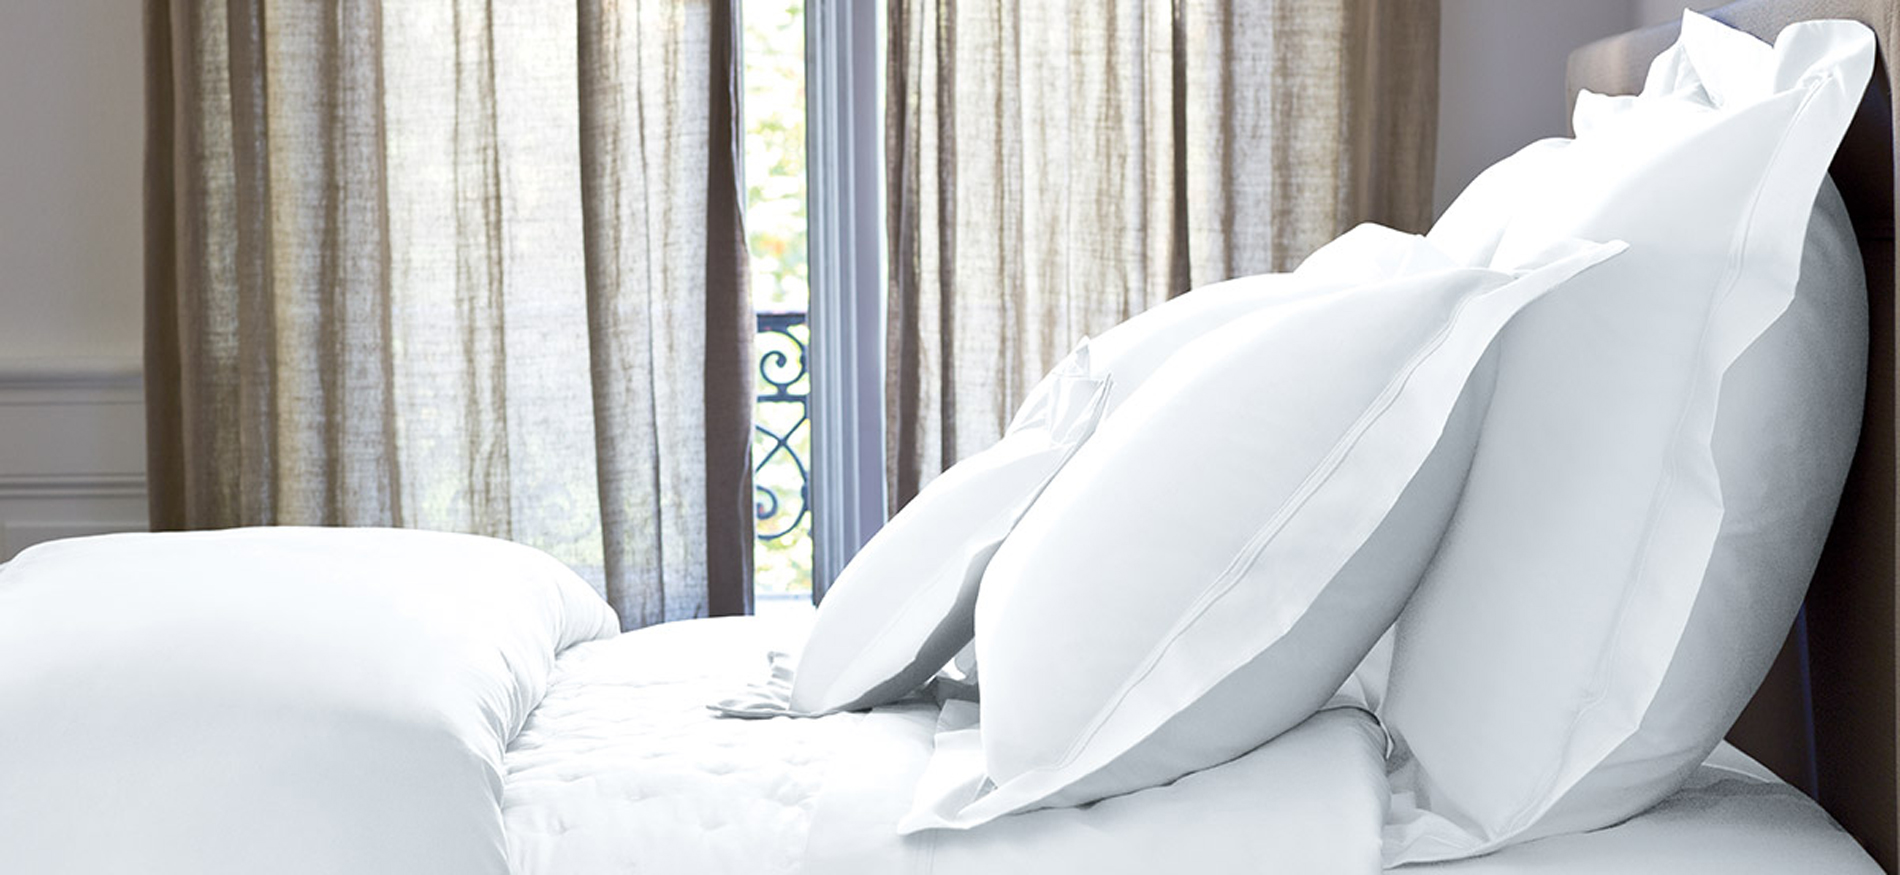 Yves Delorme Paris - Luxury bed linen since 1845